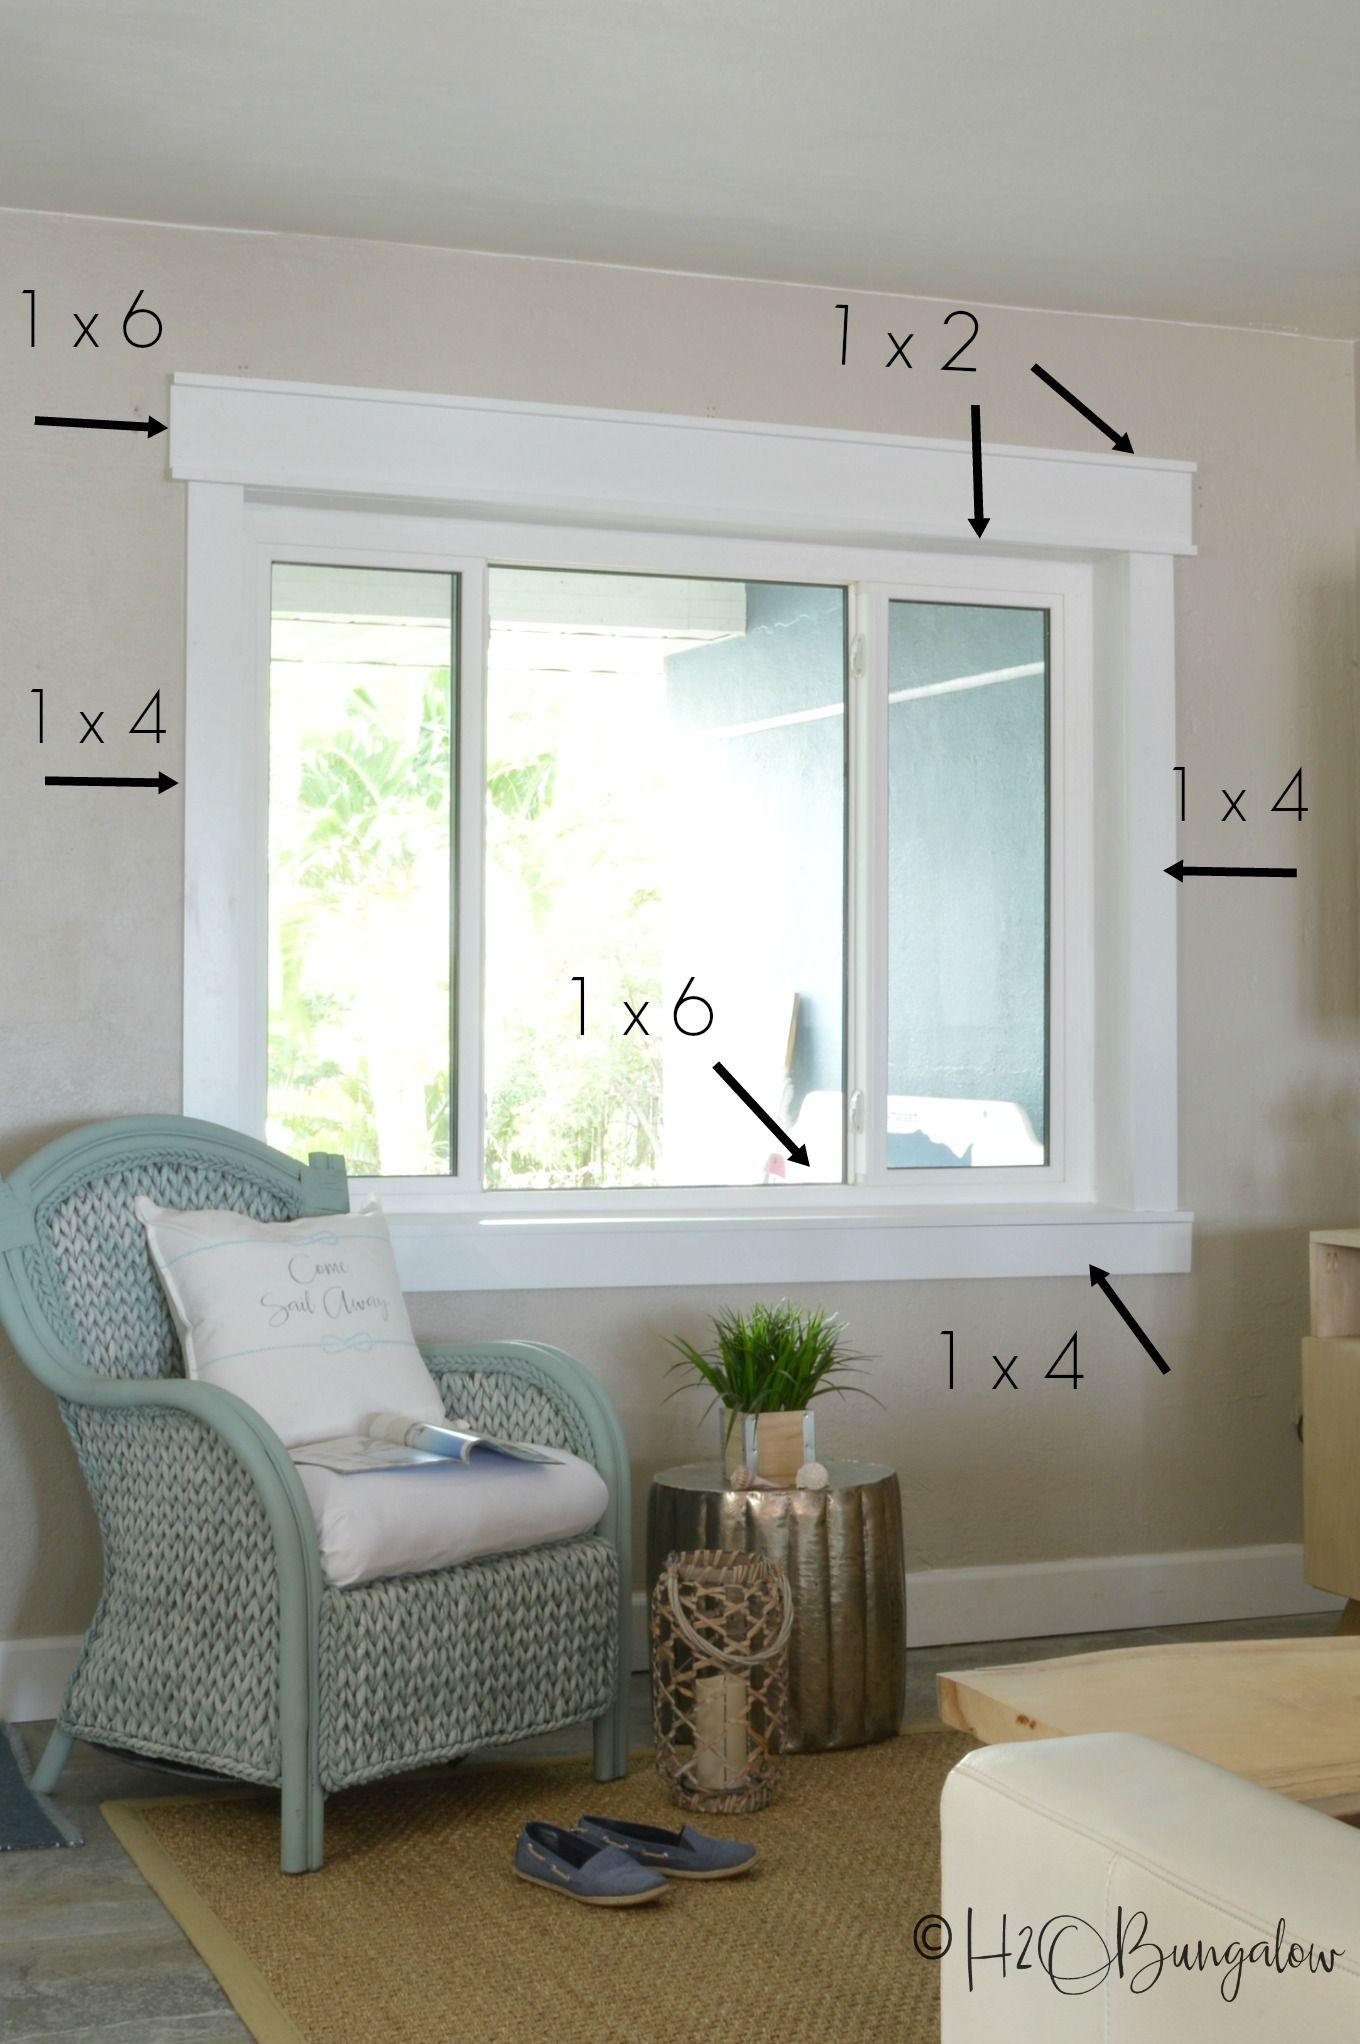 Simple Diy Craftsman Style Window Trim Tutorial H2obungalow Craftsman Window Trim Interior Window Trim House Trim